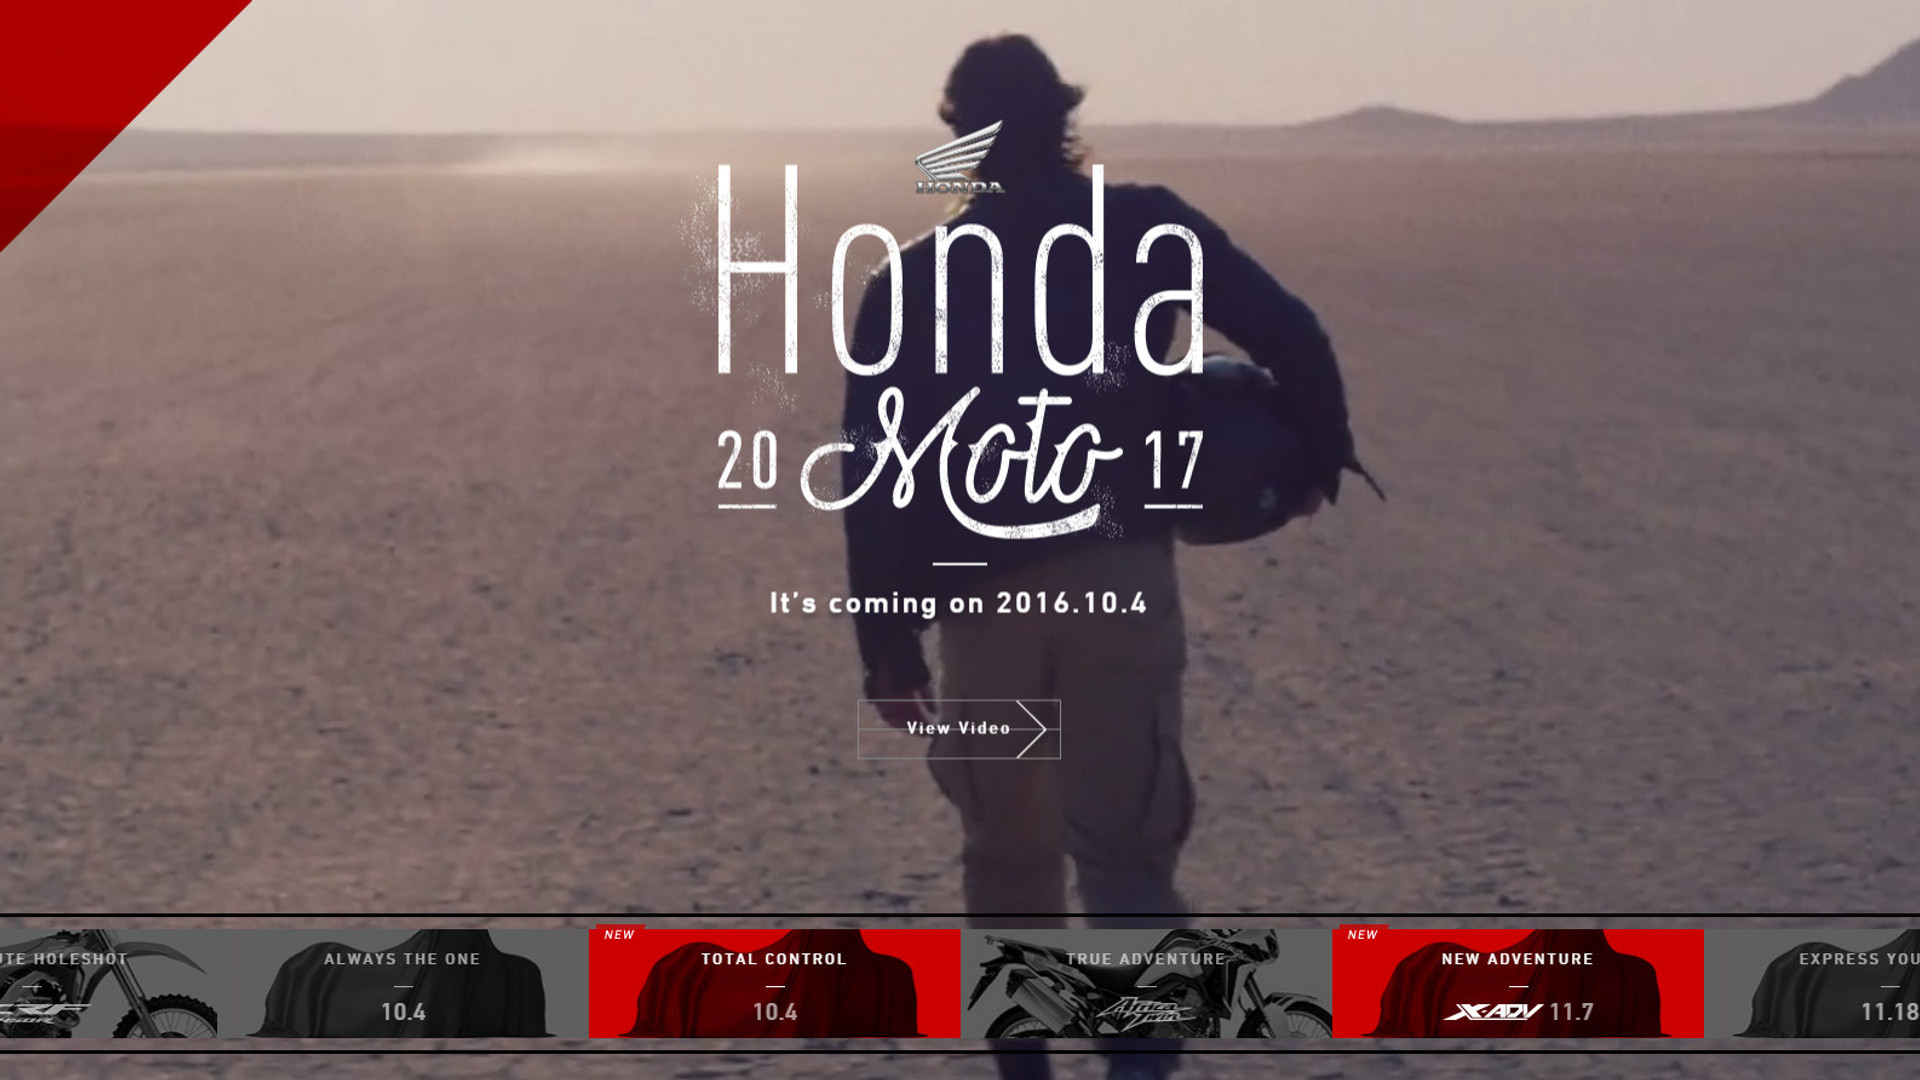 Honda Motorcycle / Global Brand Campaign